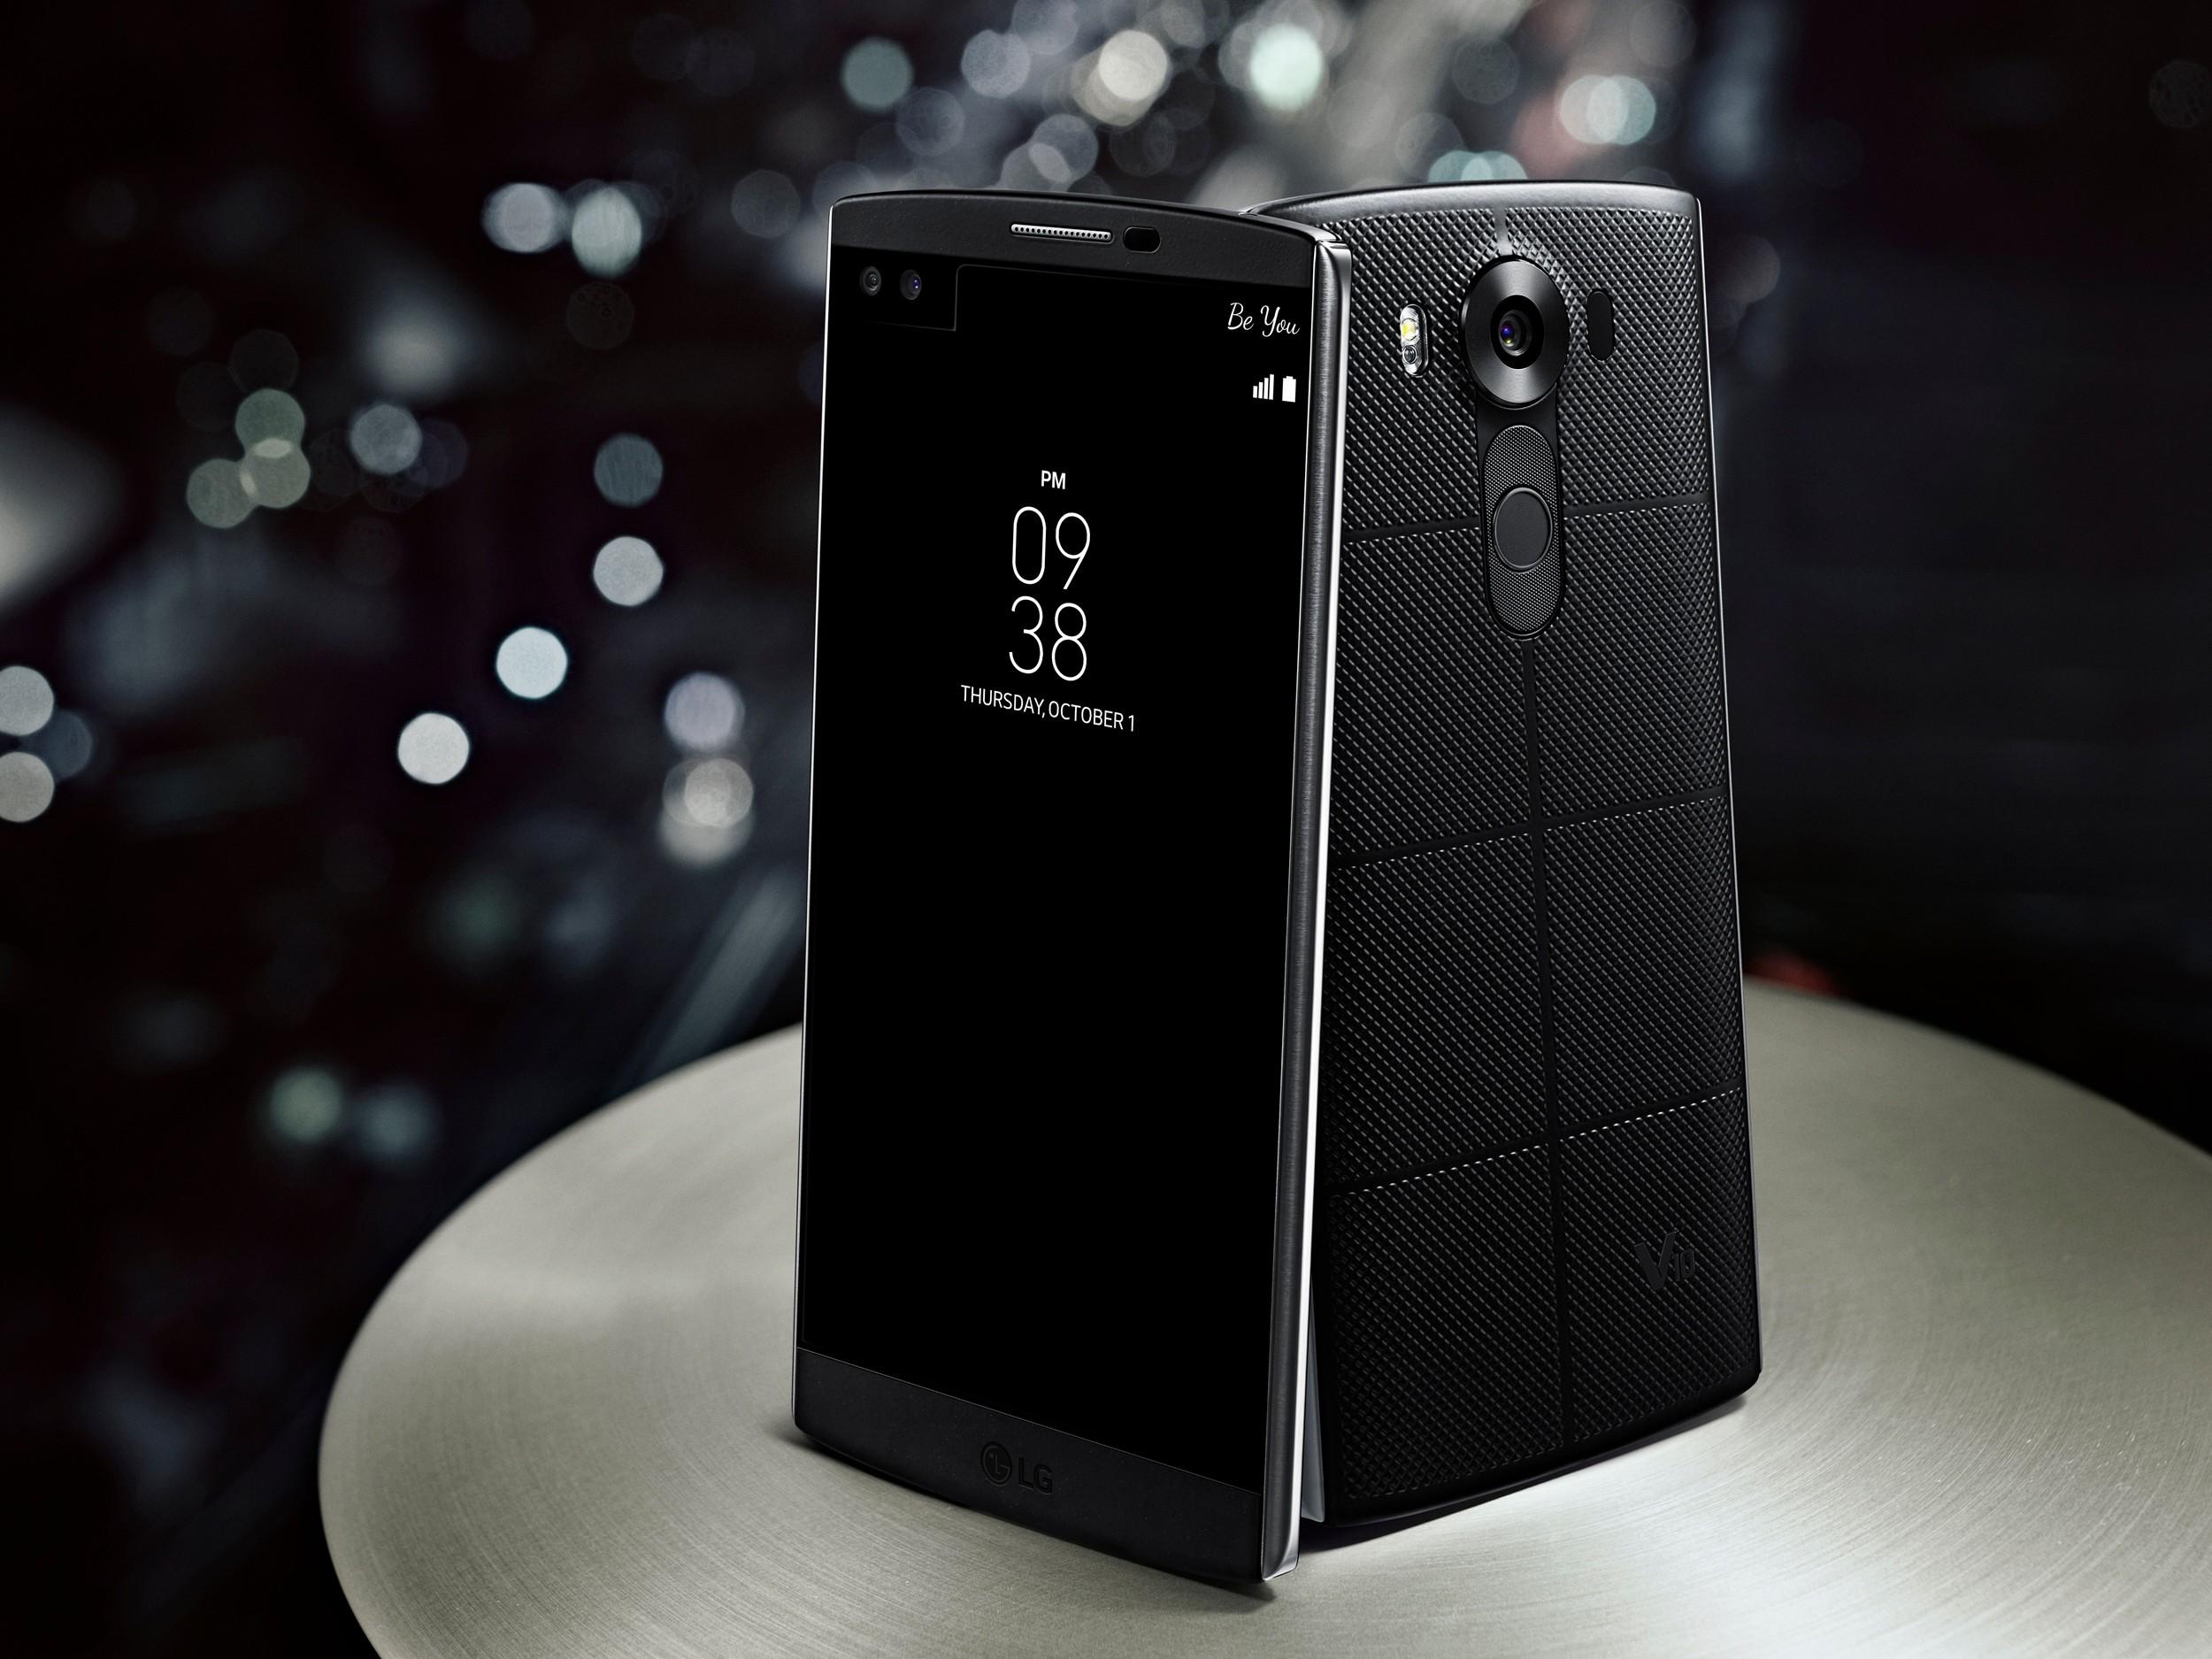 lg 10. lg-v10-black-01 lg 10 l